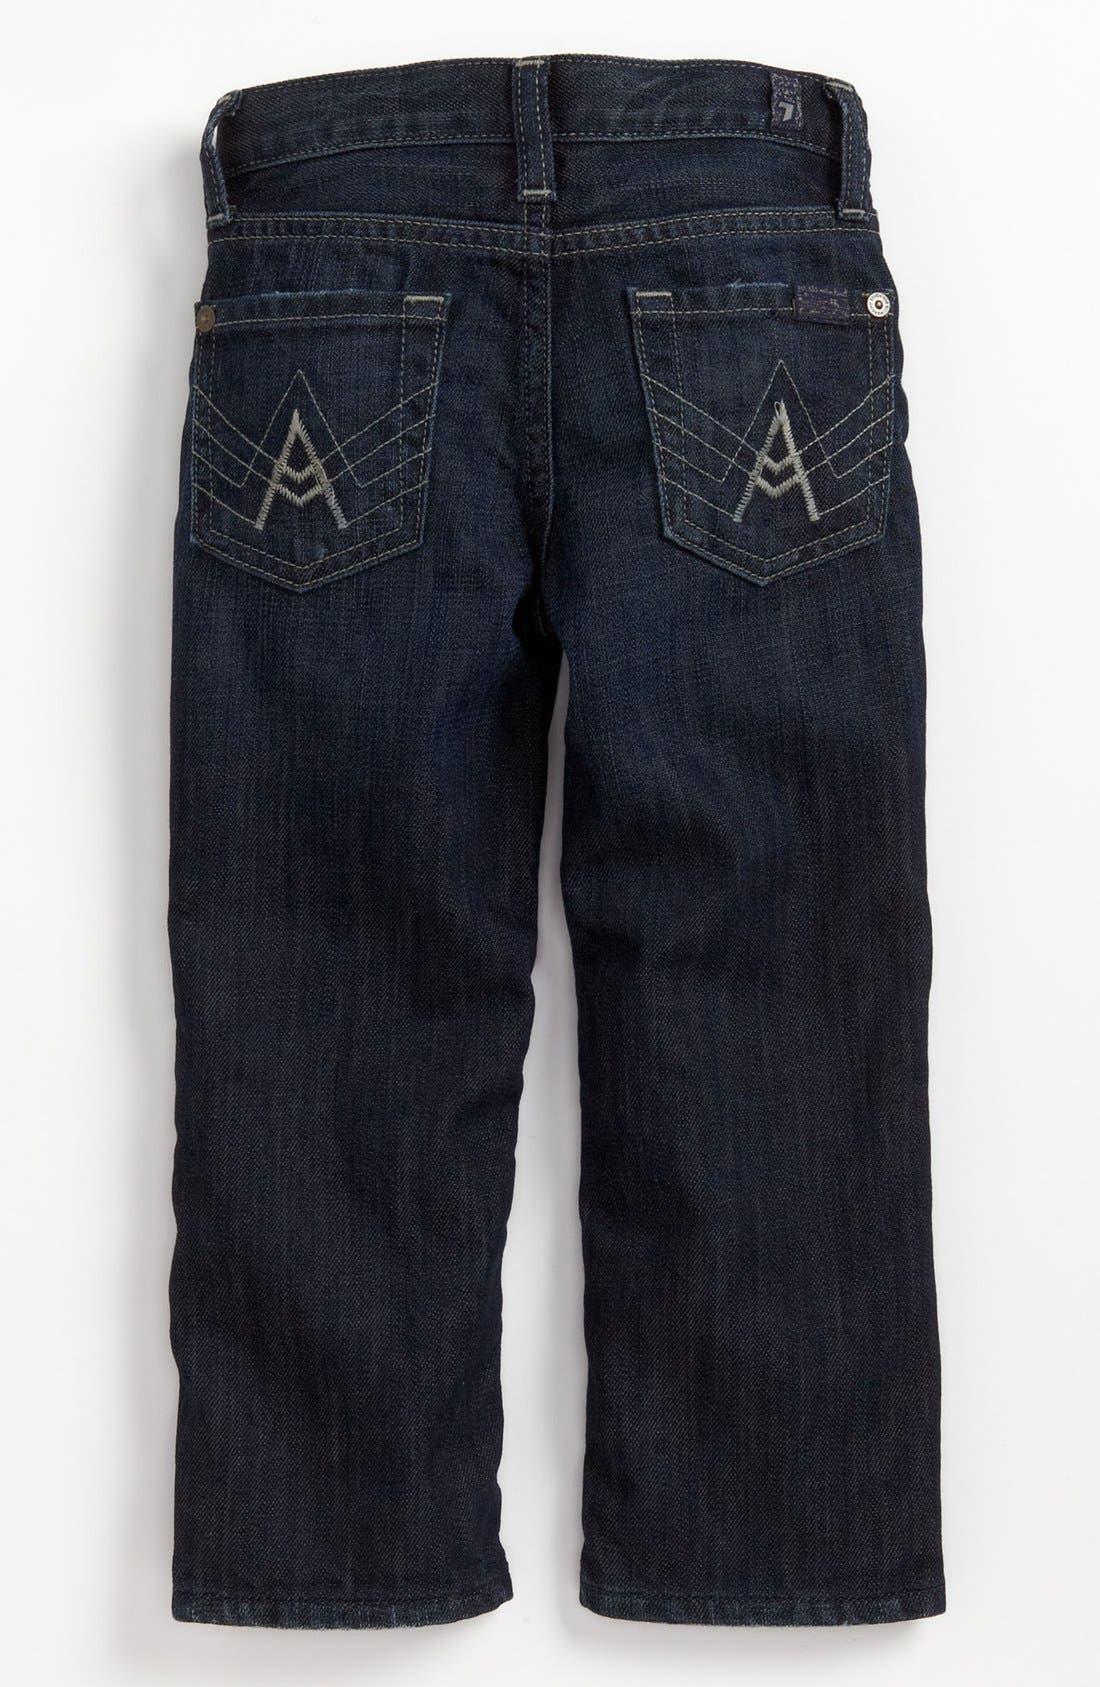 Alternate Image 1 Selected - 7 For All Mankind® 'Standard' Straight Leg Jeans (Toddler Boys) (Online Only)